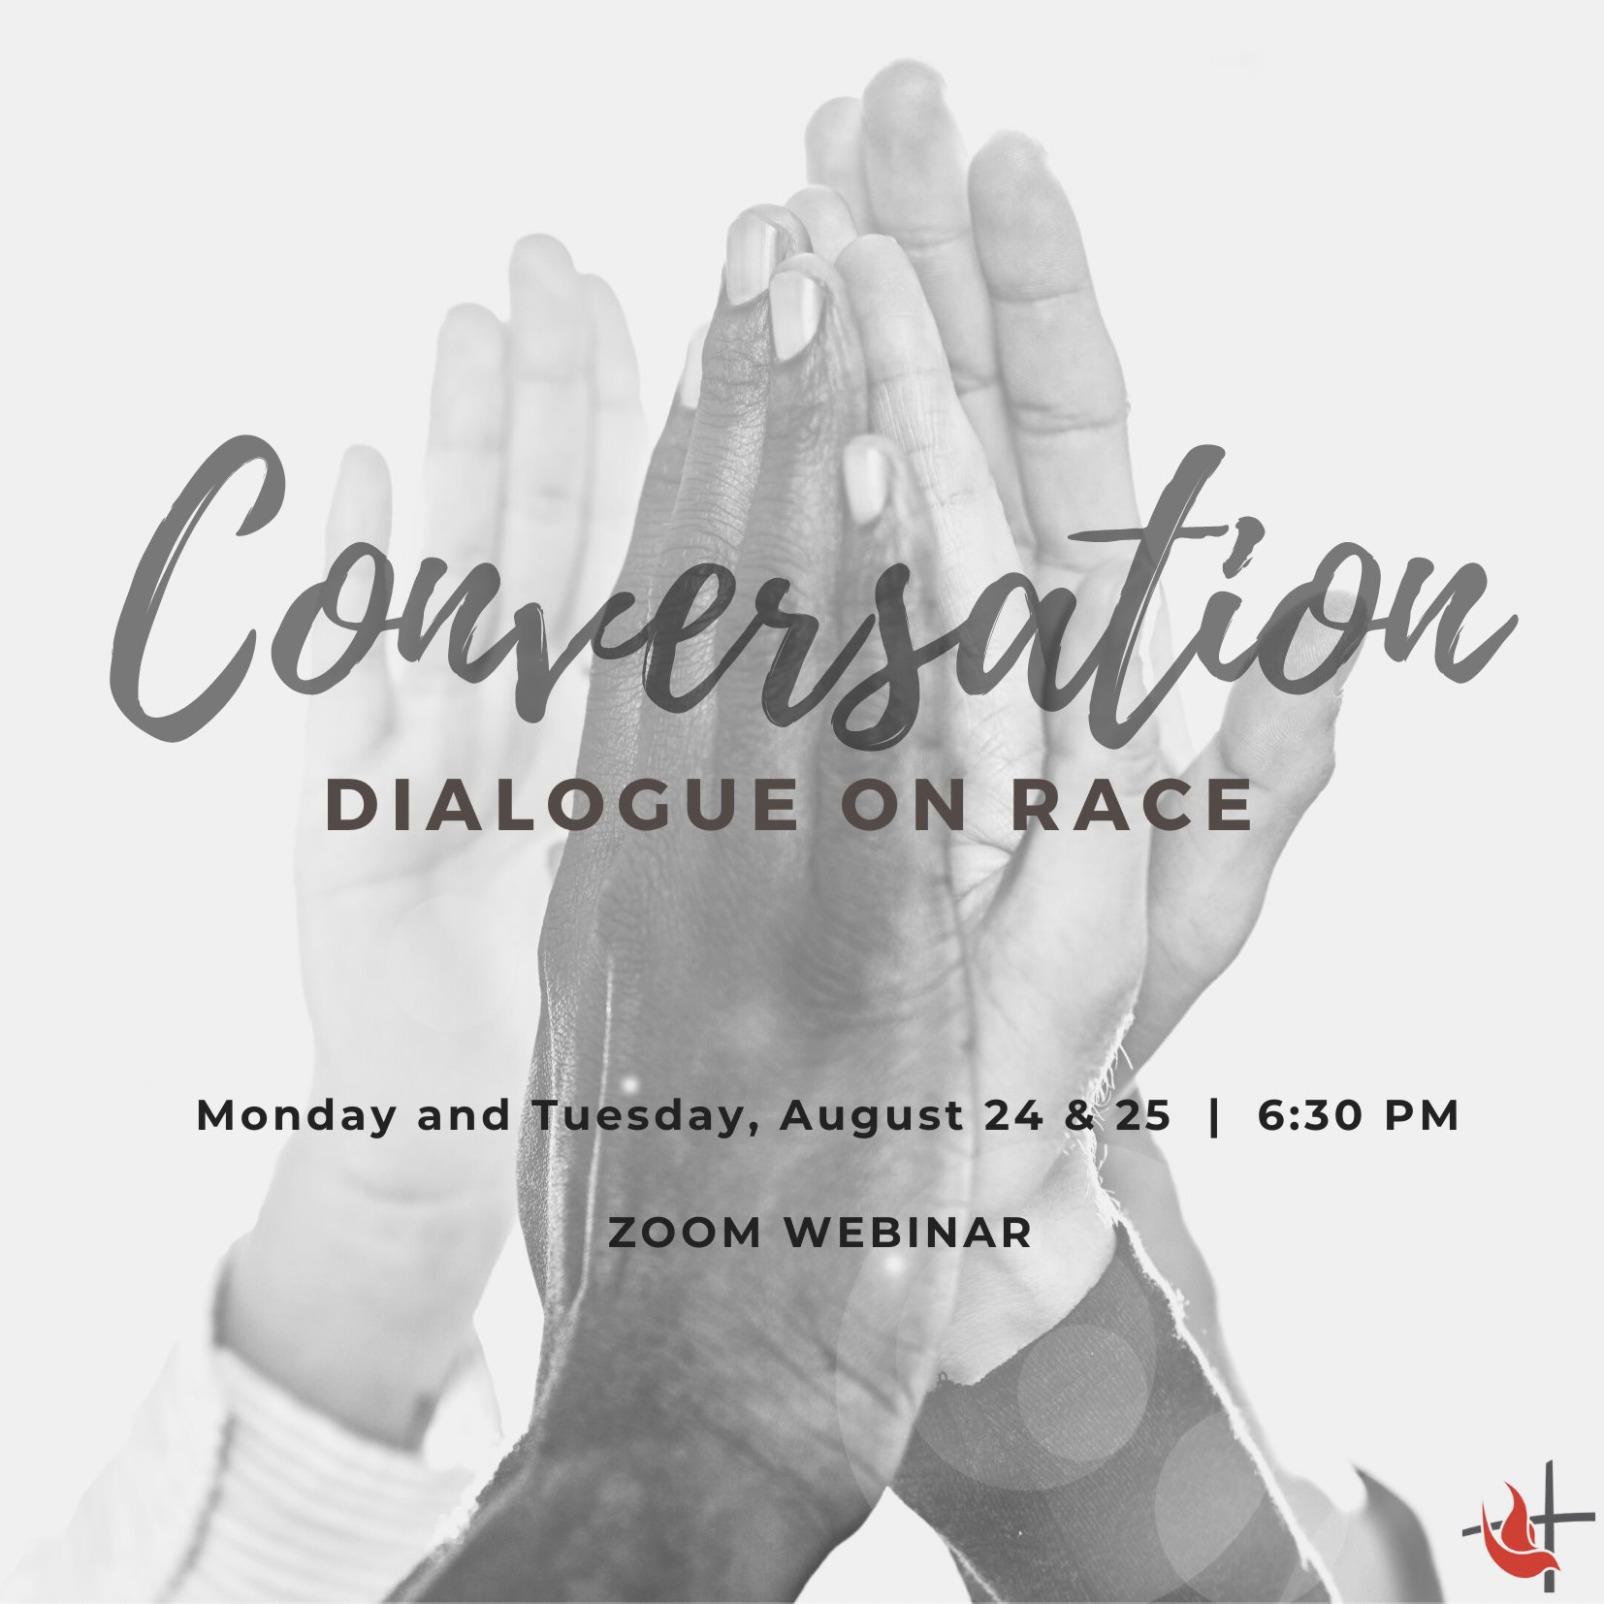 Conversation Dialogue on Race